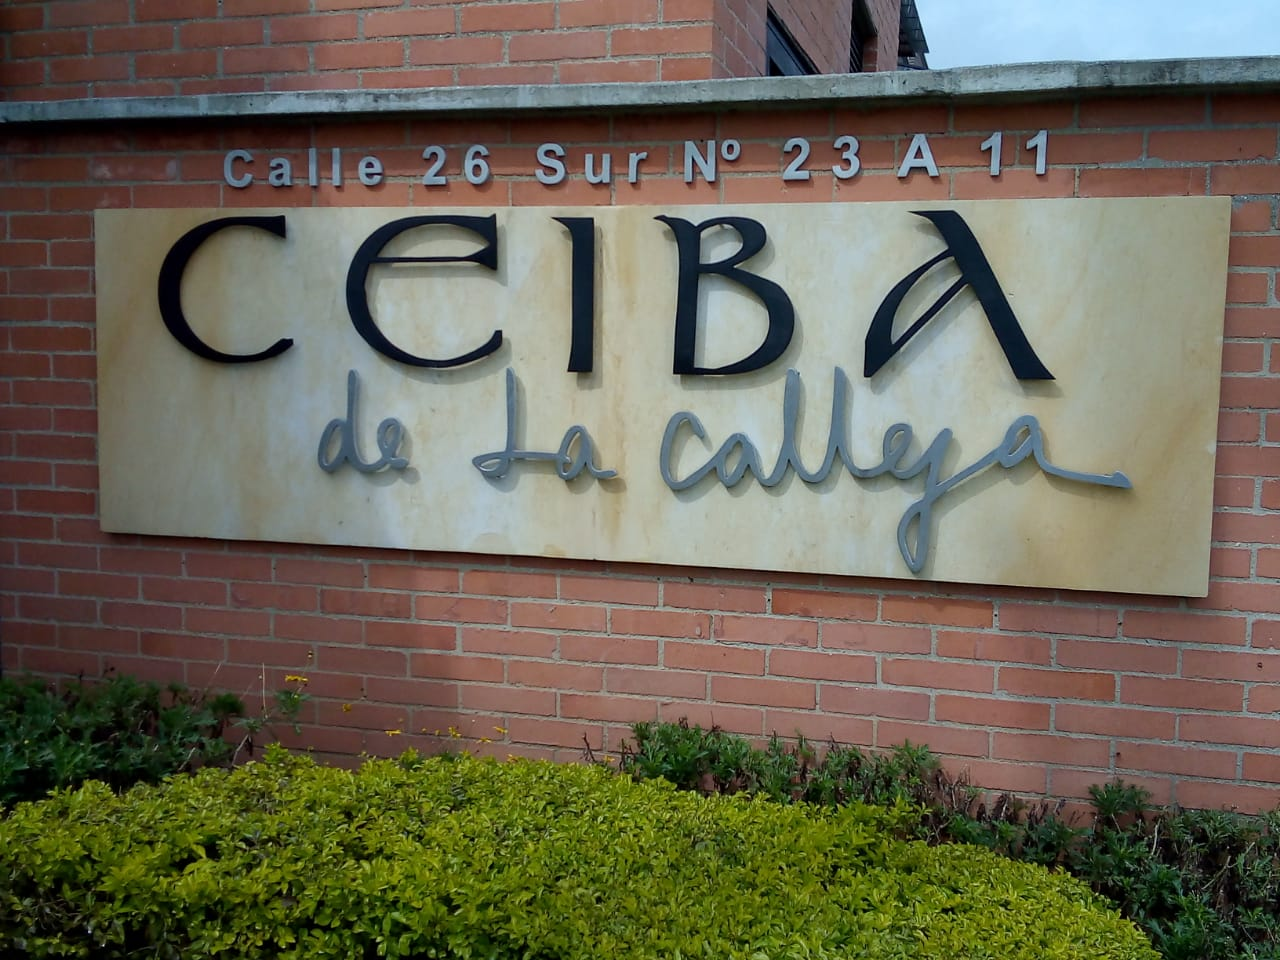 Ceiba de La Calleja